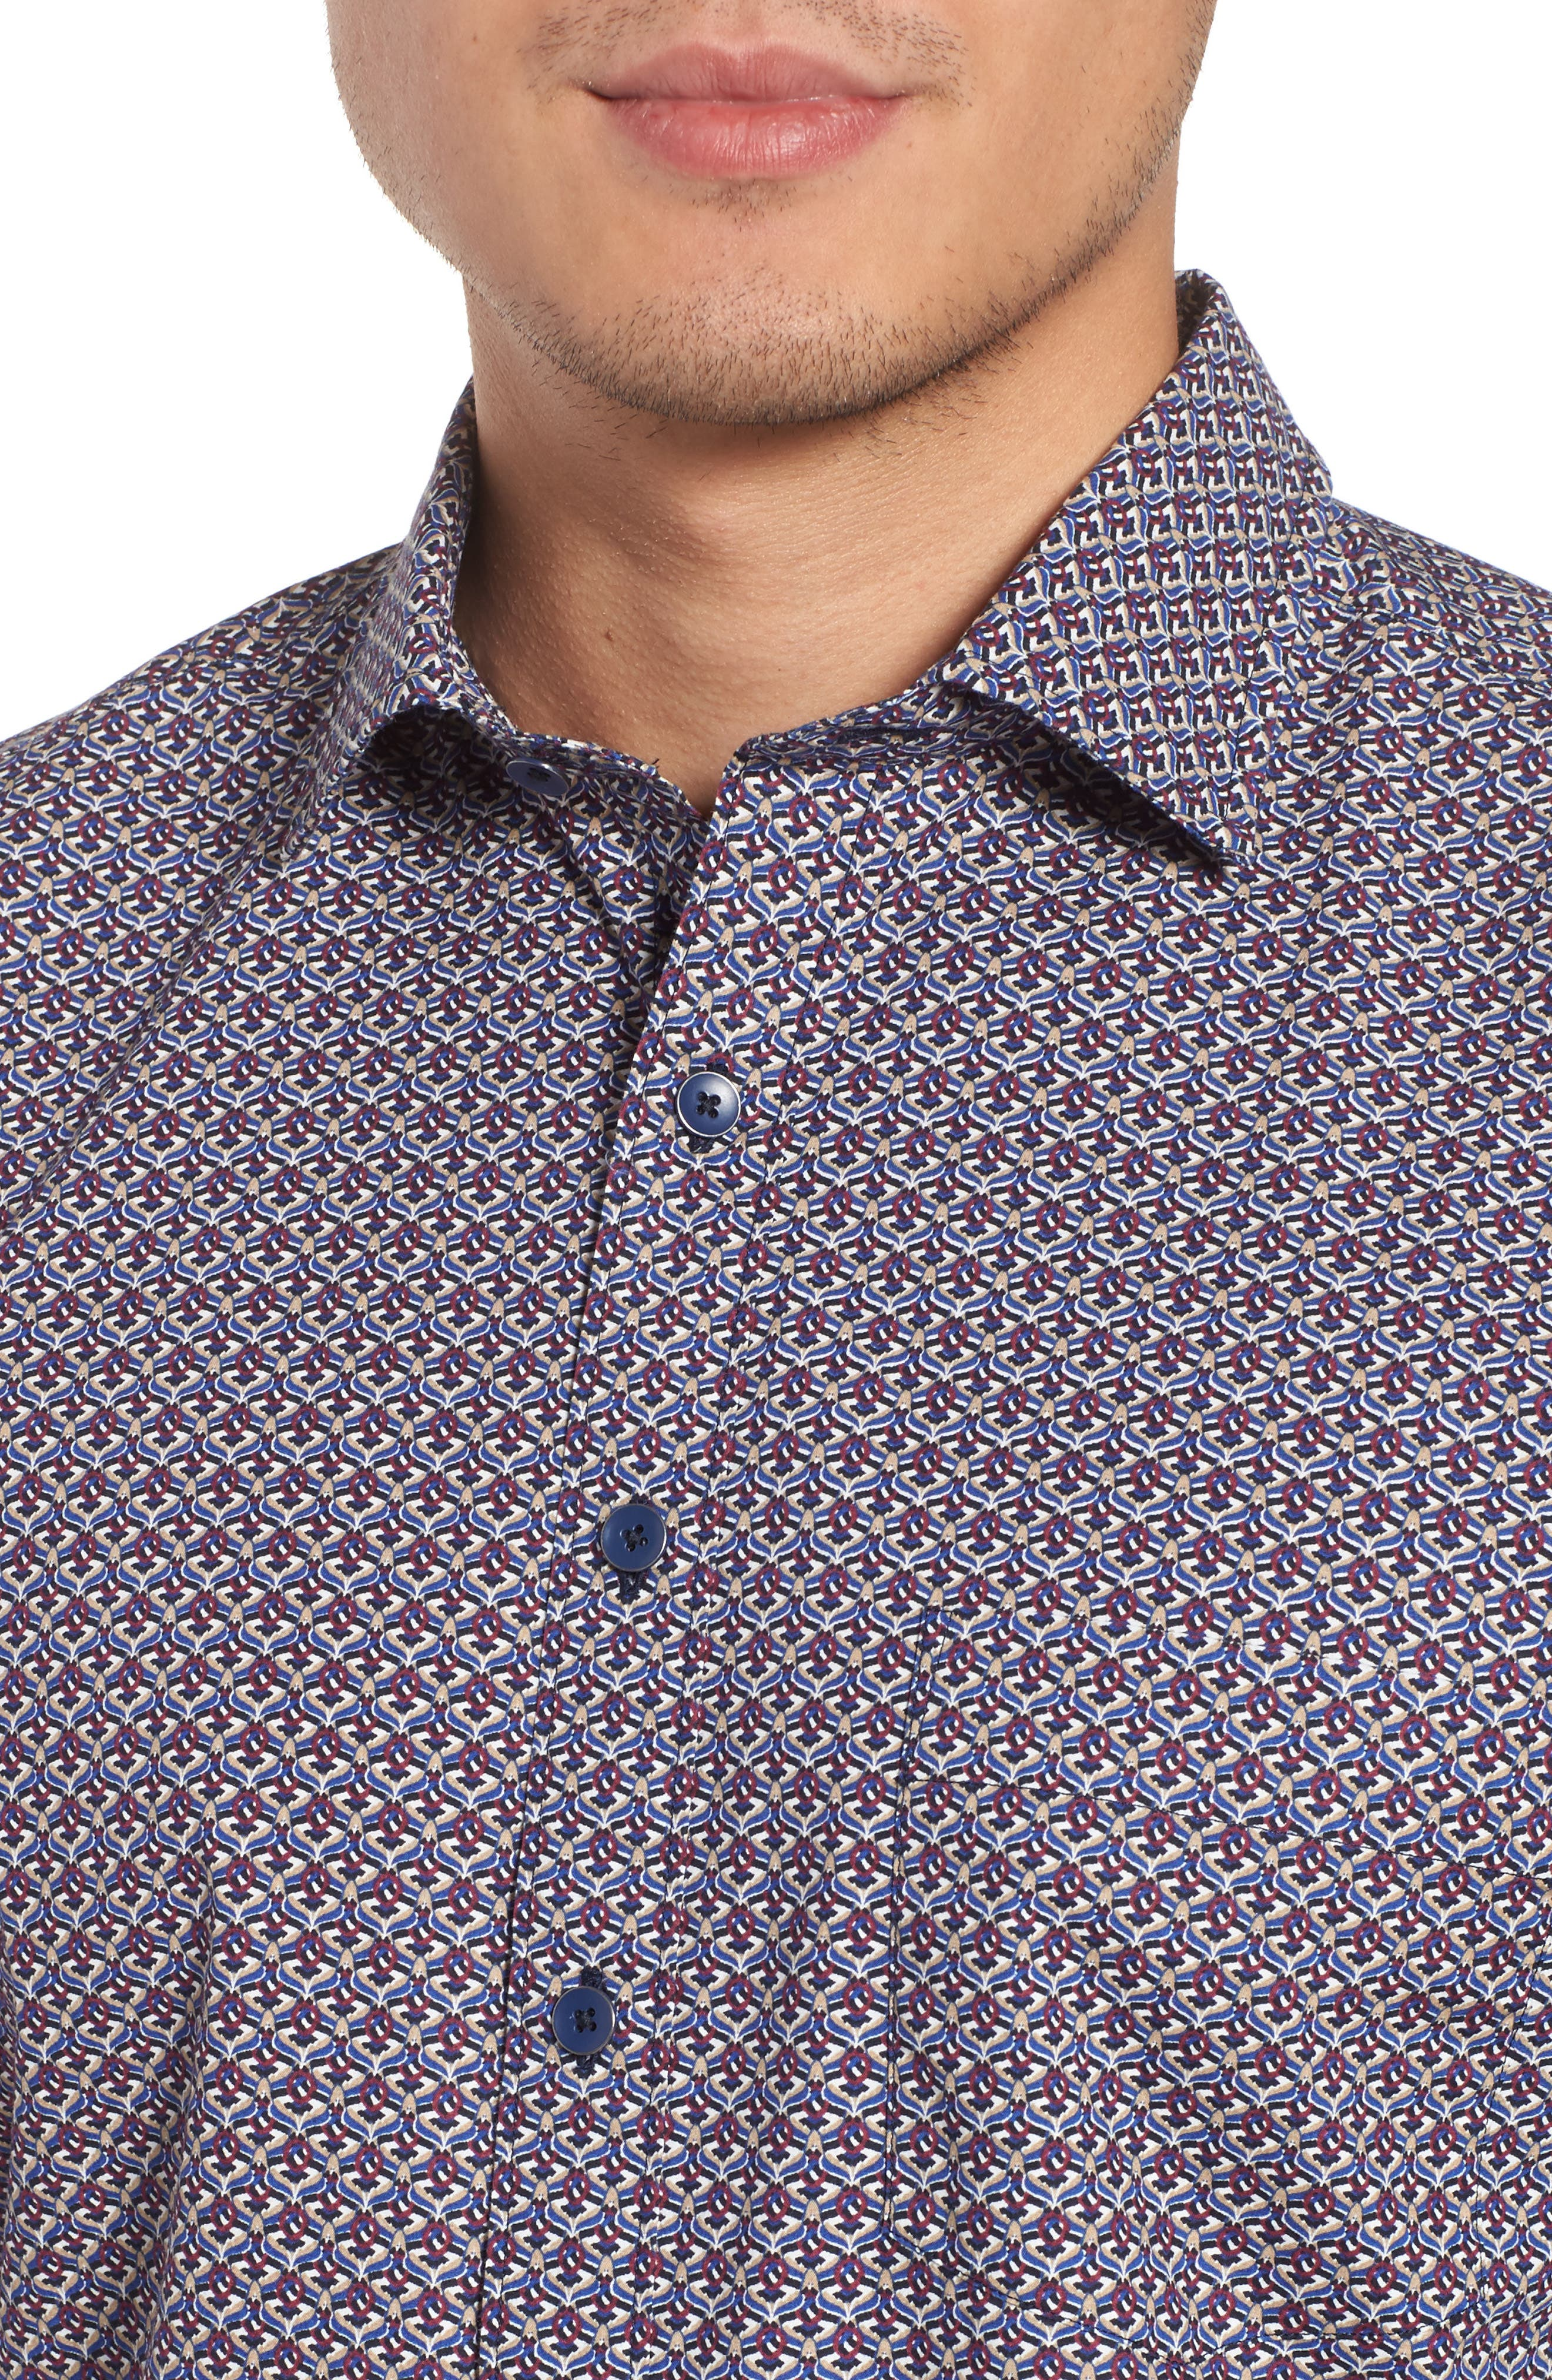 Fenton Park Regular Fit Sport Shirt,                             Alternate thumbnail 4, color,                             Royal